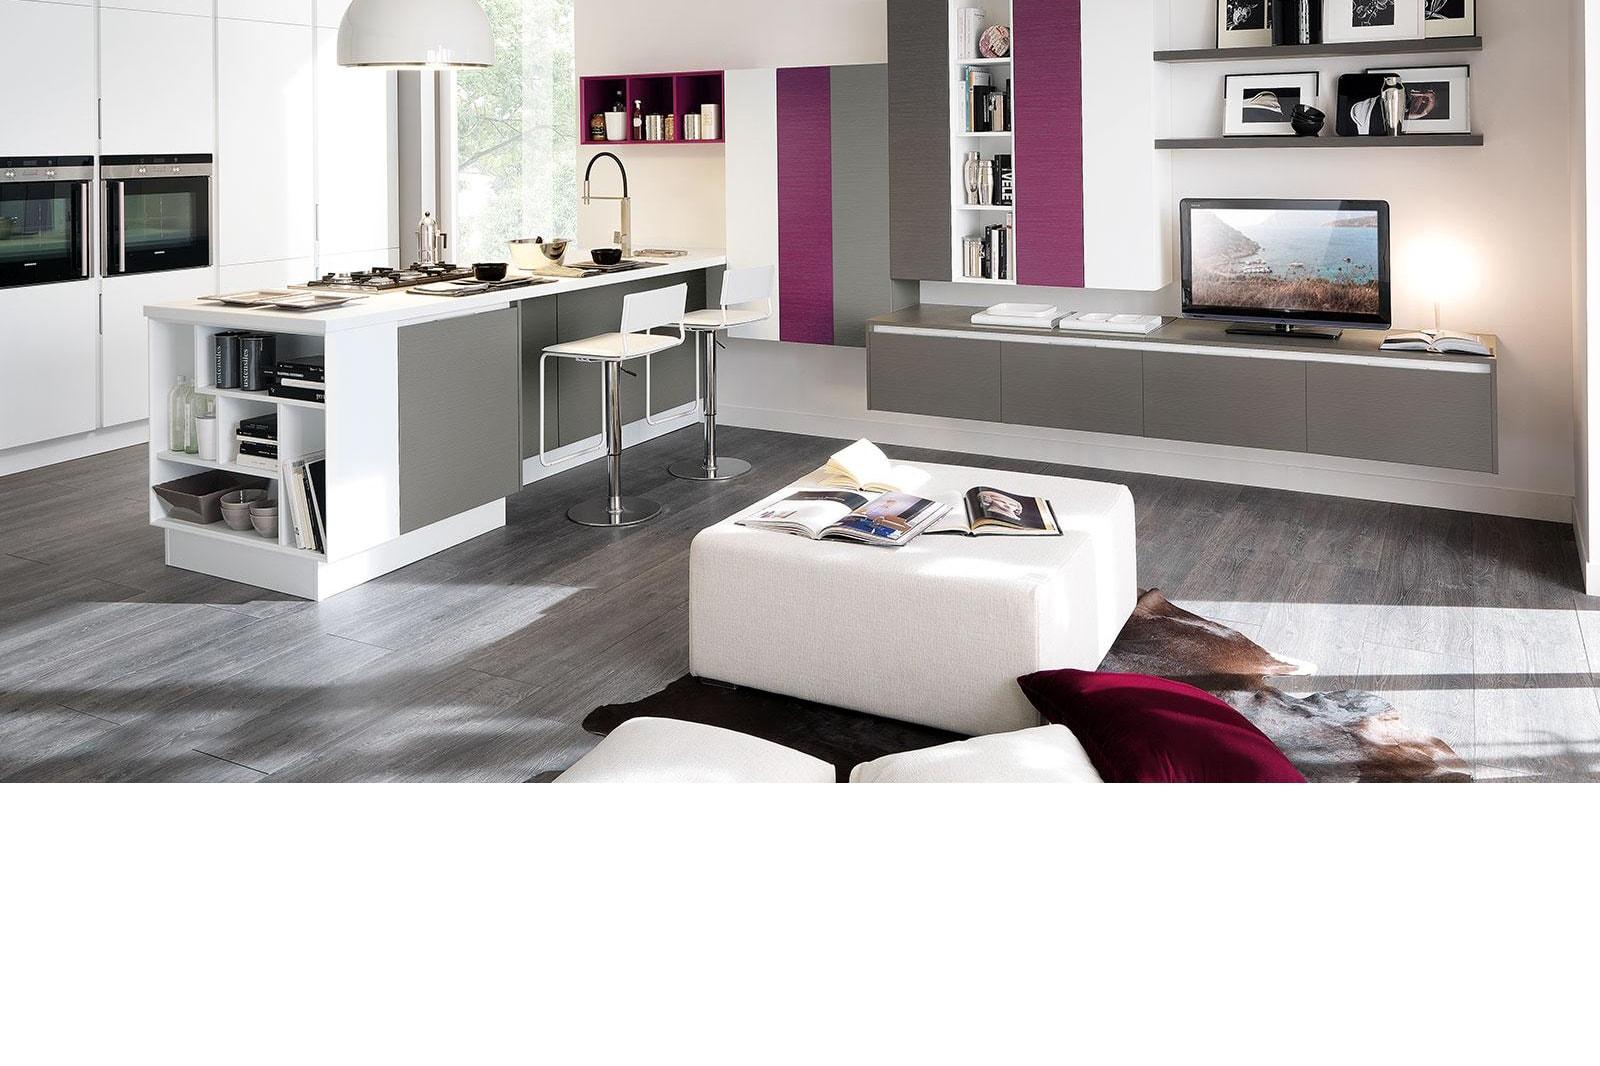 Lussora Kitchen Studio